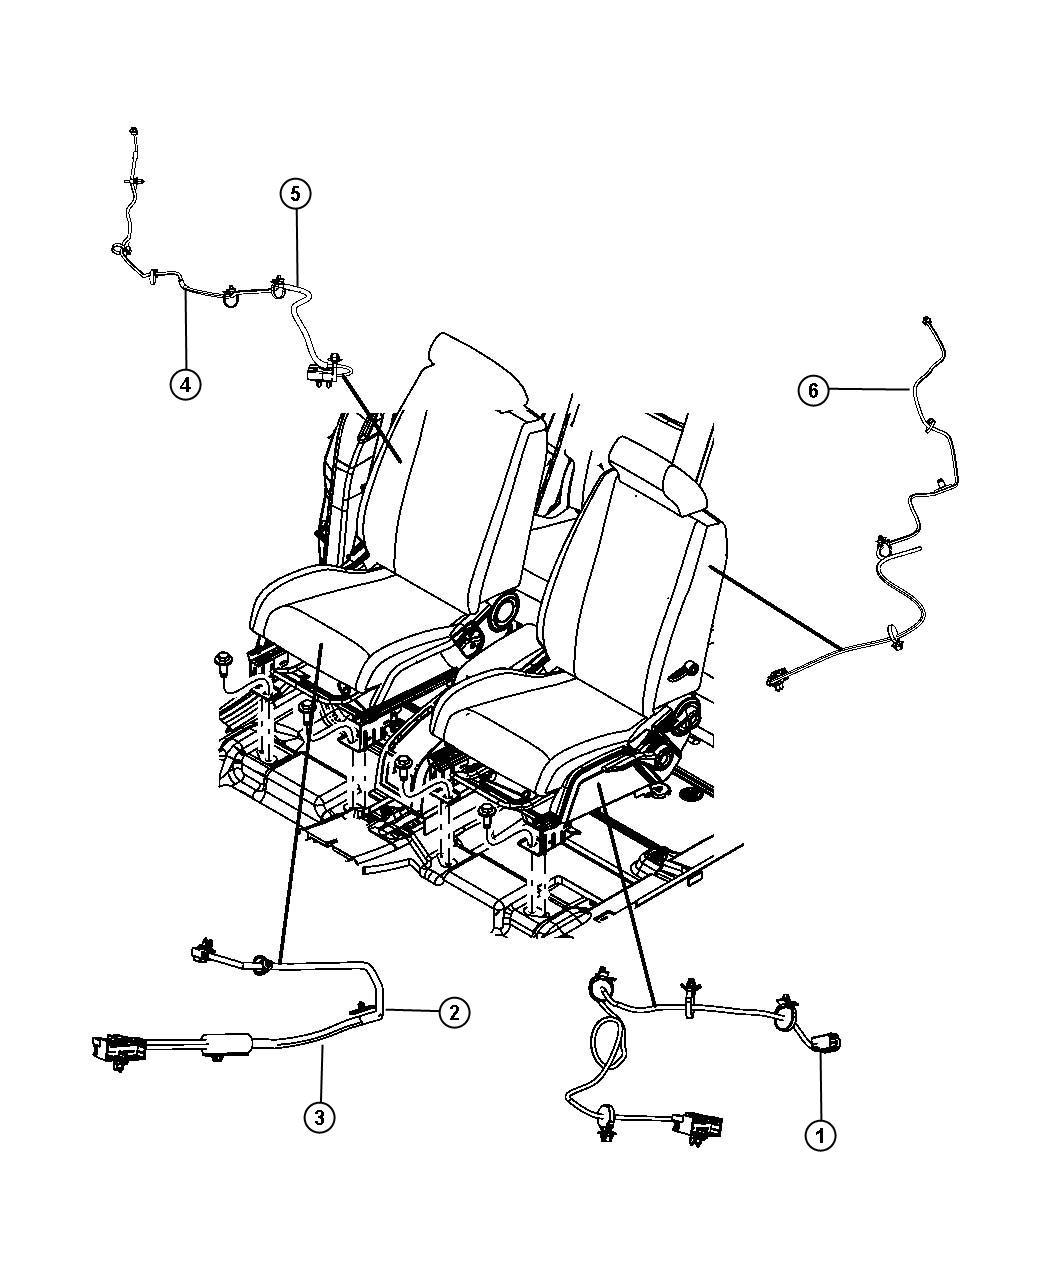 Dodge Journey Wiring. Power seat, seat. Export. Trim